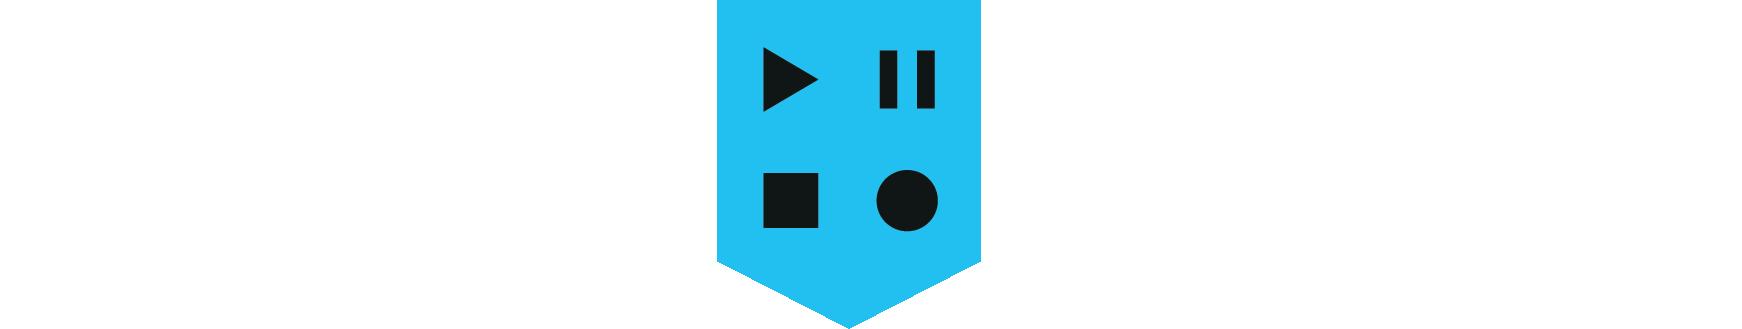 Visual Domain logo